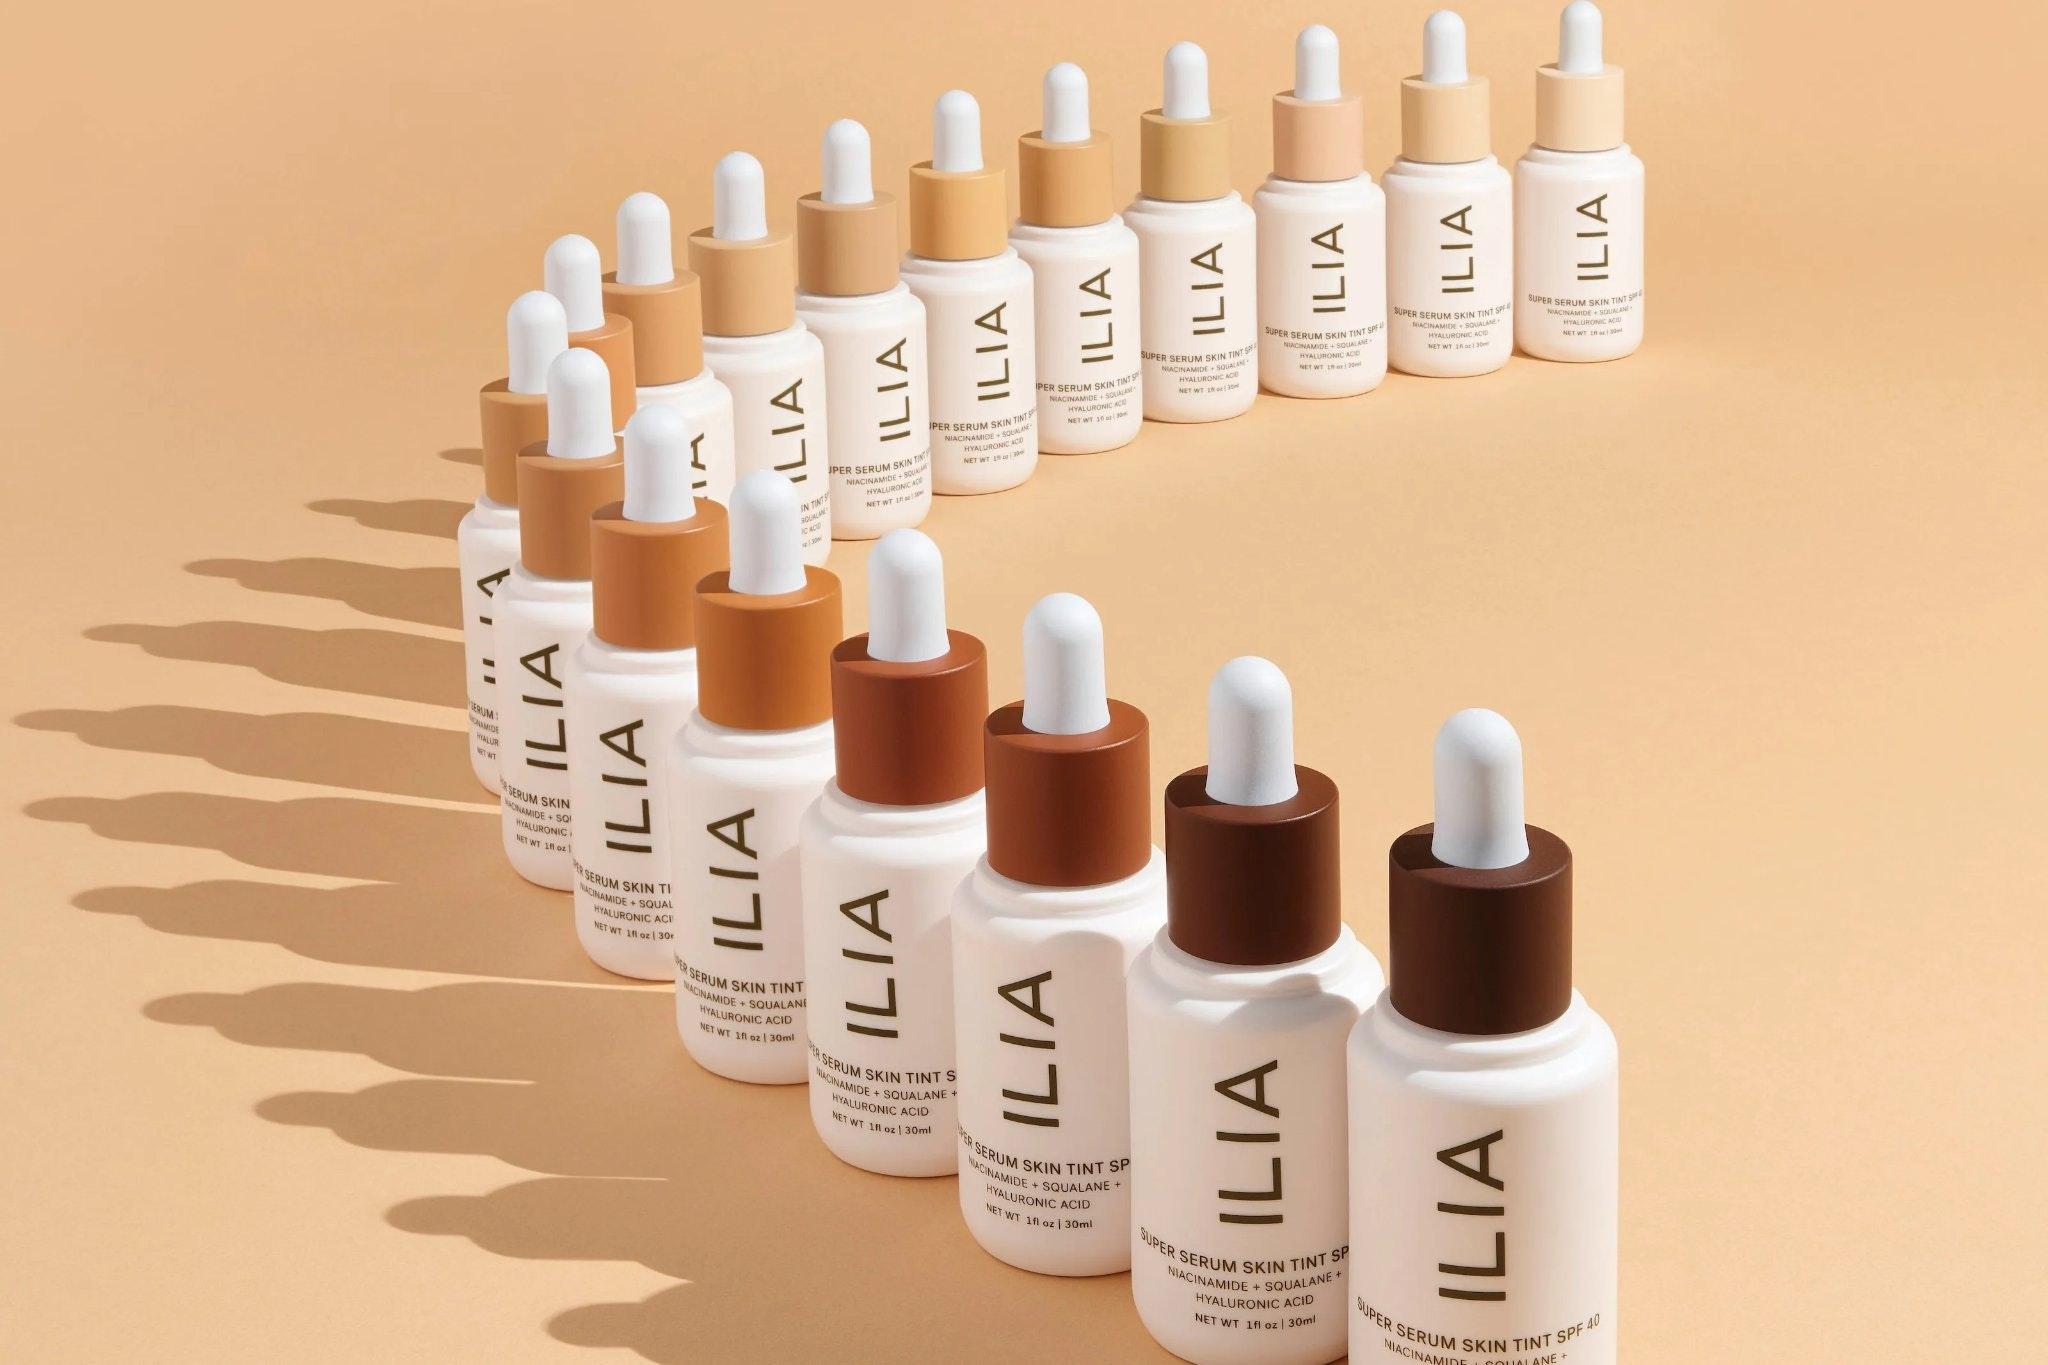 Super Serum Skin Tint Spf 40 Foundation